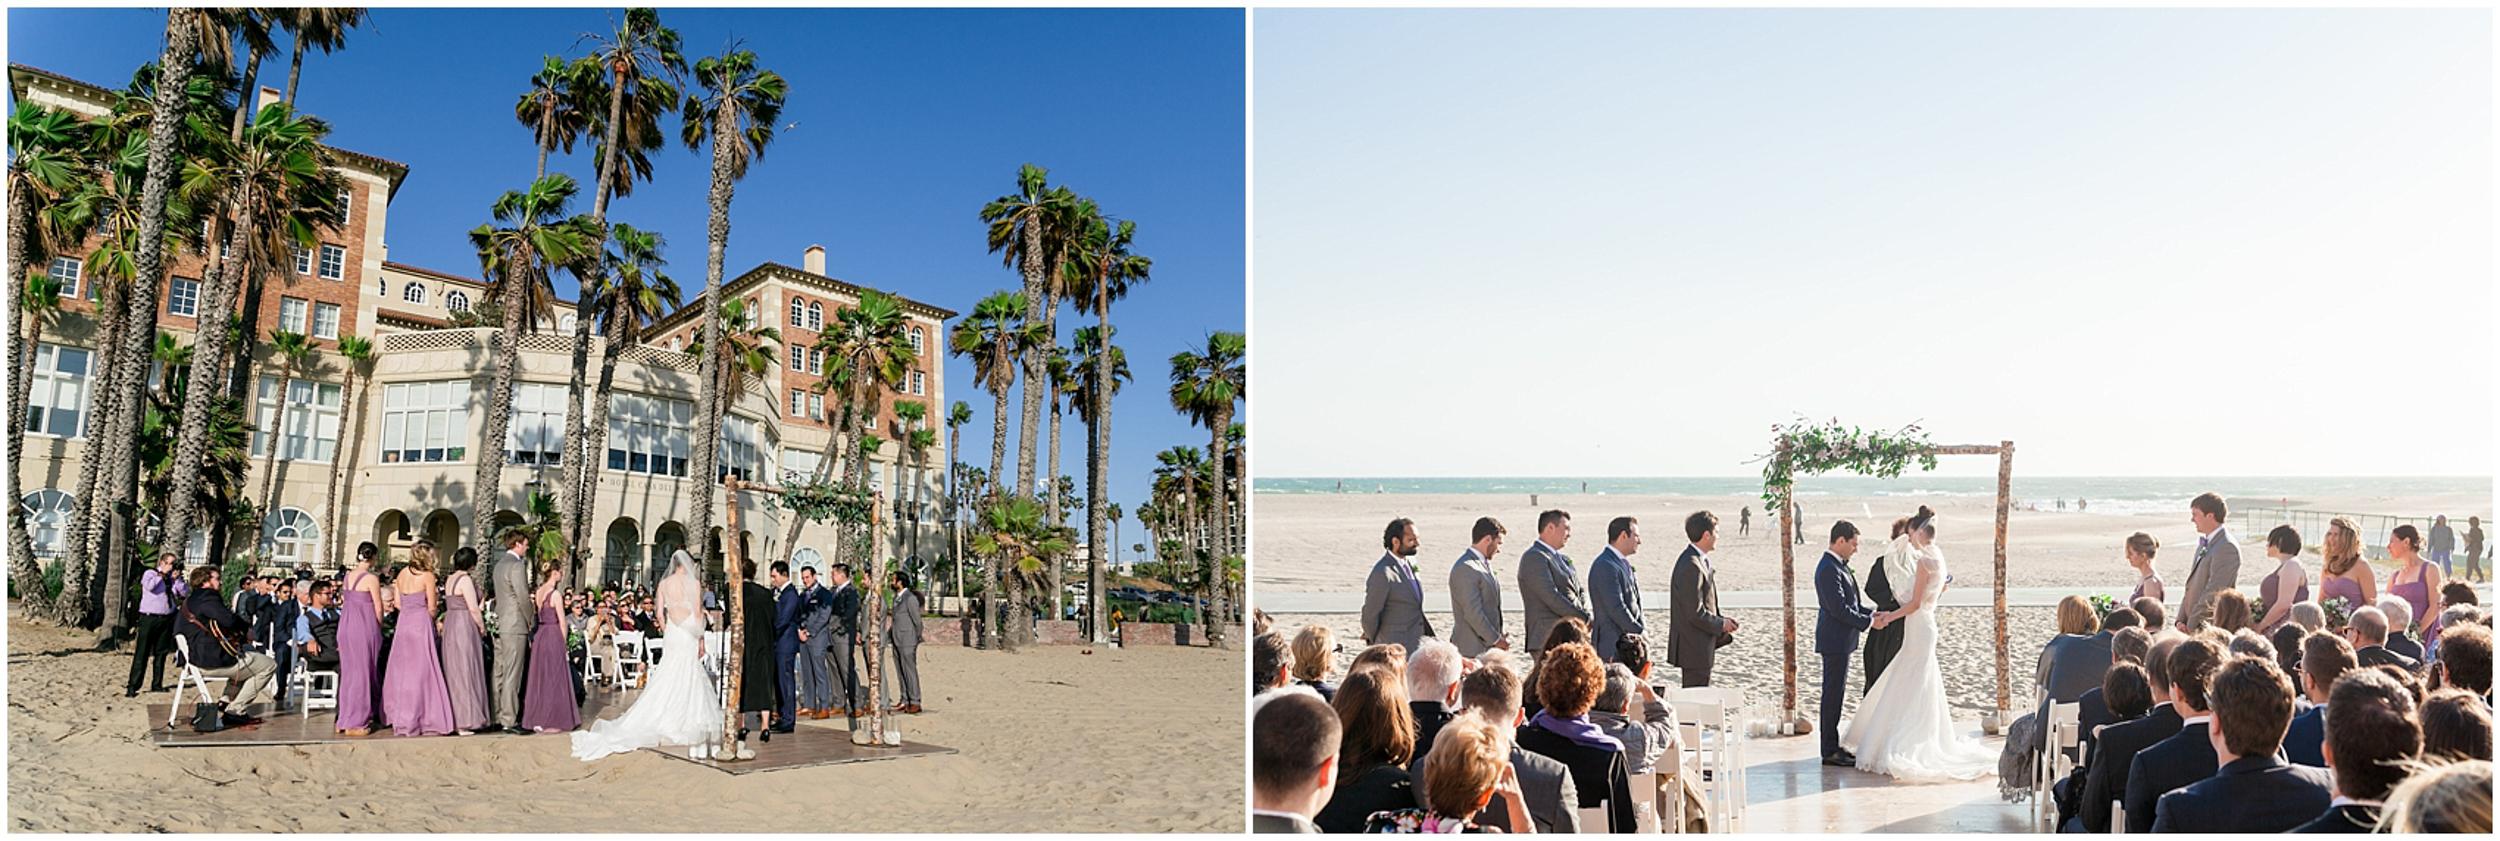 Casa Del Mar Wedding Photography Smetona Photo-0040.jpg